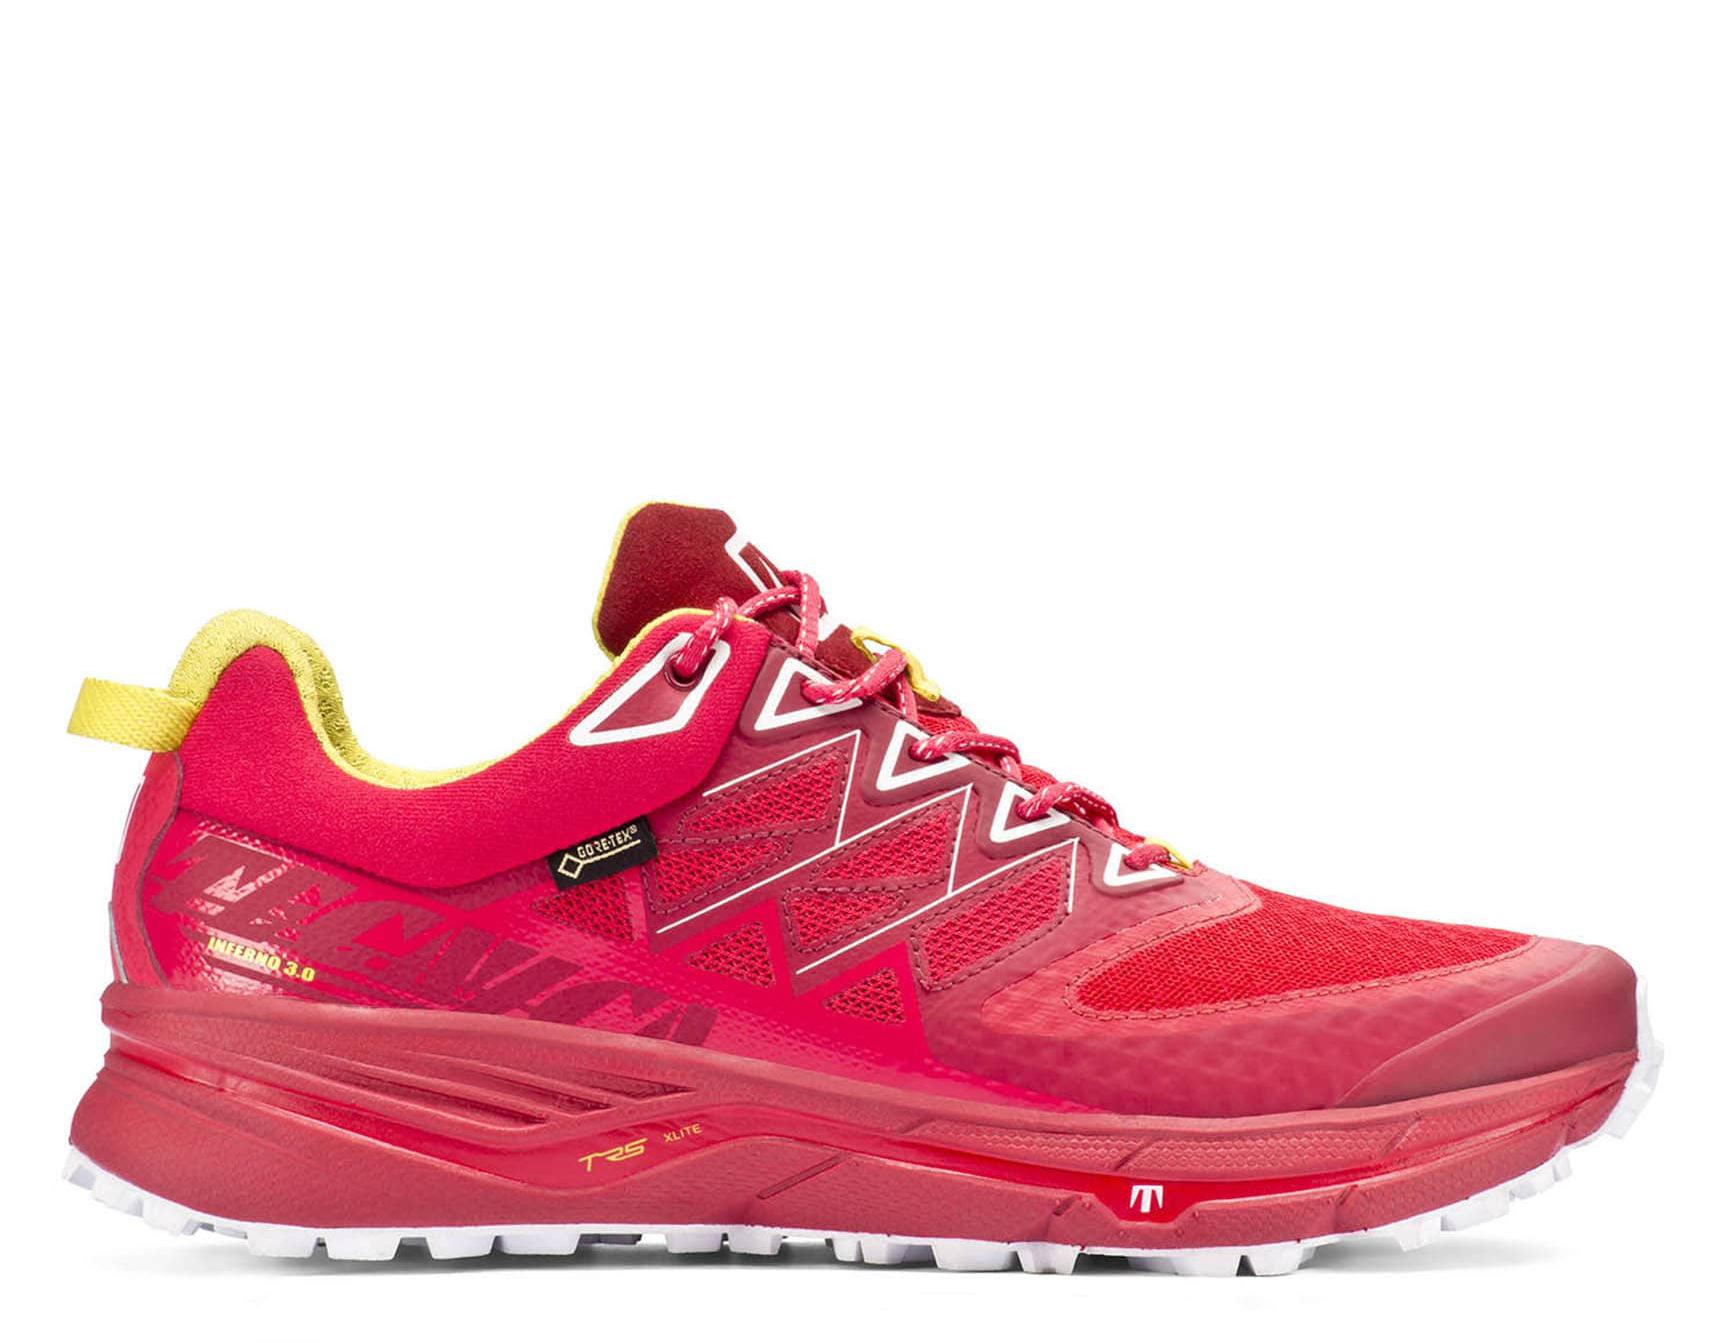 Details zu Tecnica Trailschuh Inferno Xlite 3.0 Gr 38 EU US 7 UK 5 Schuh pink Damen MN J18